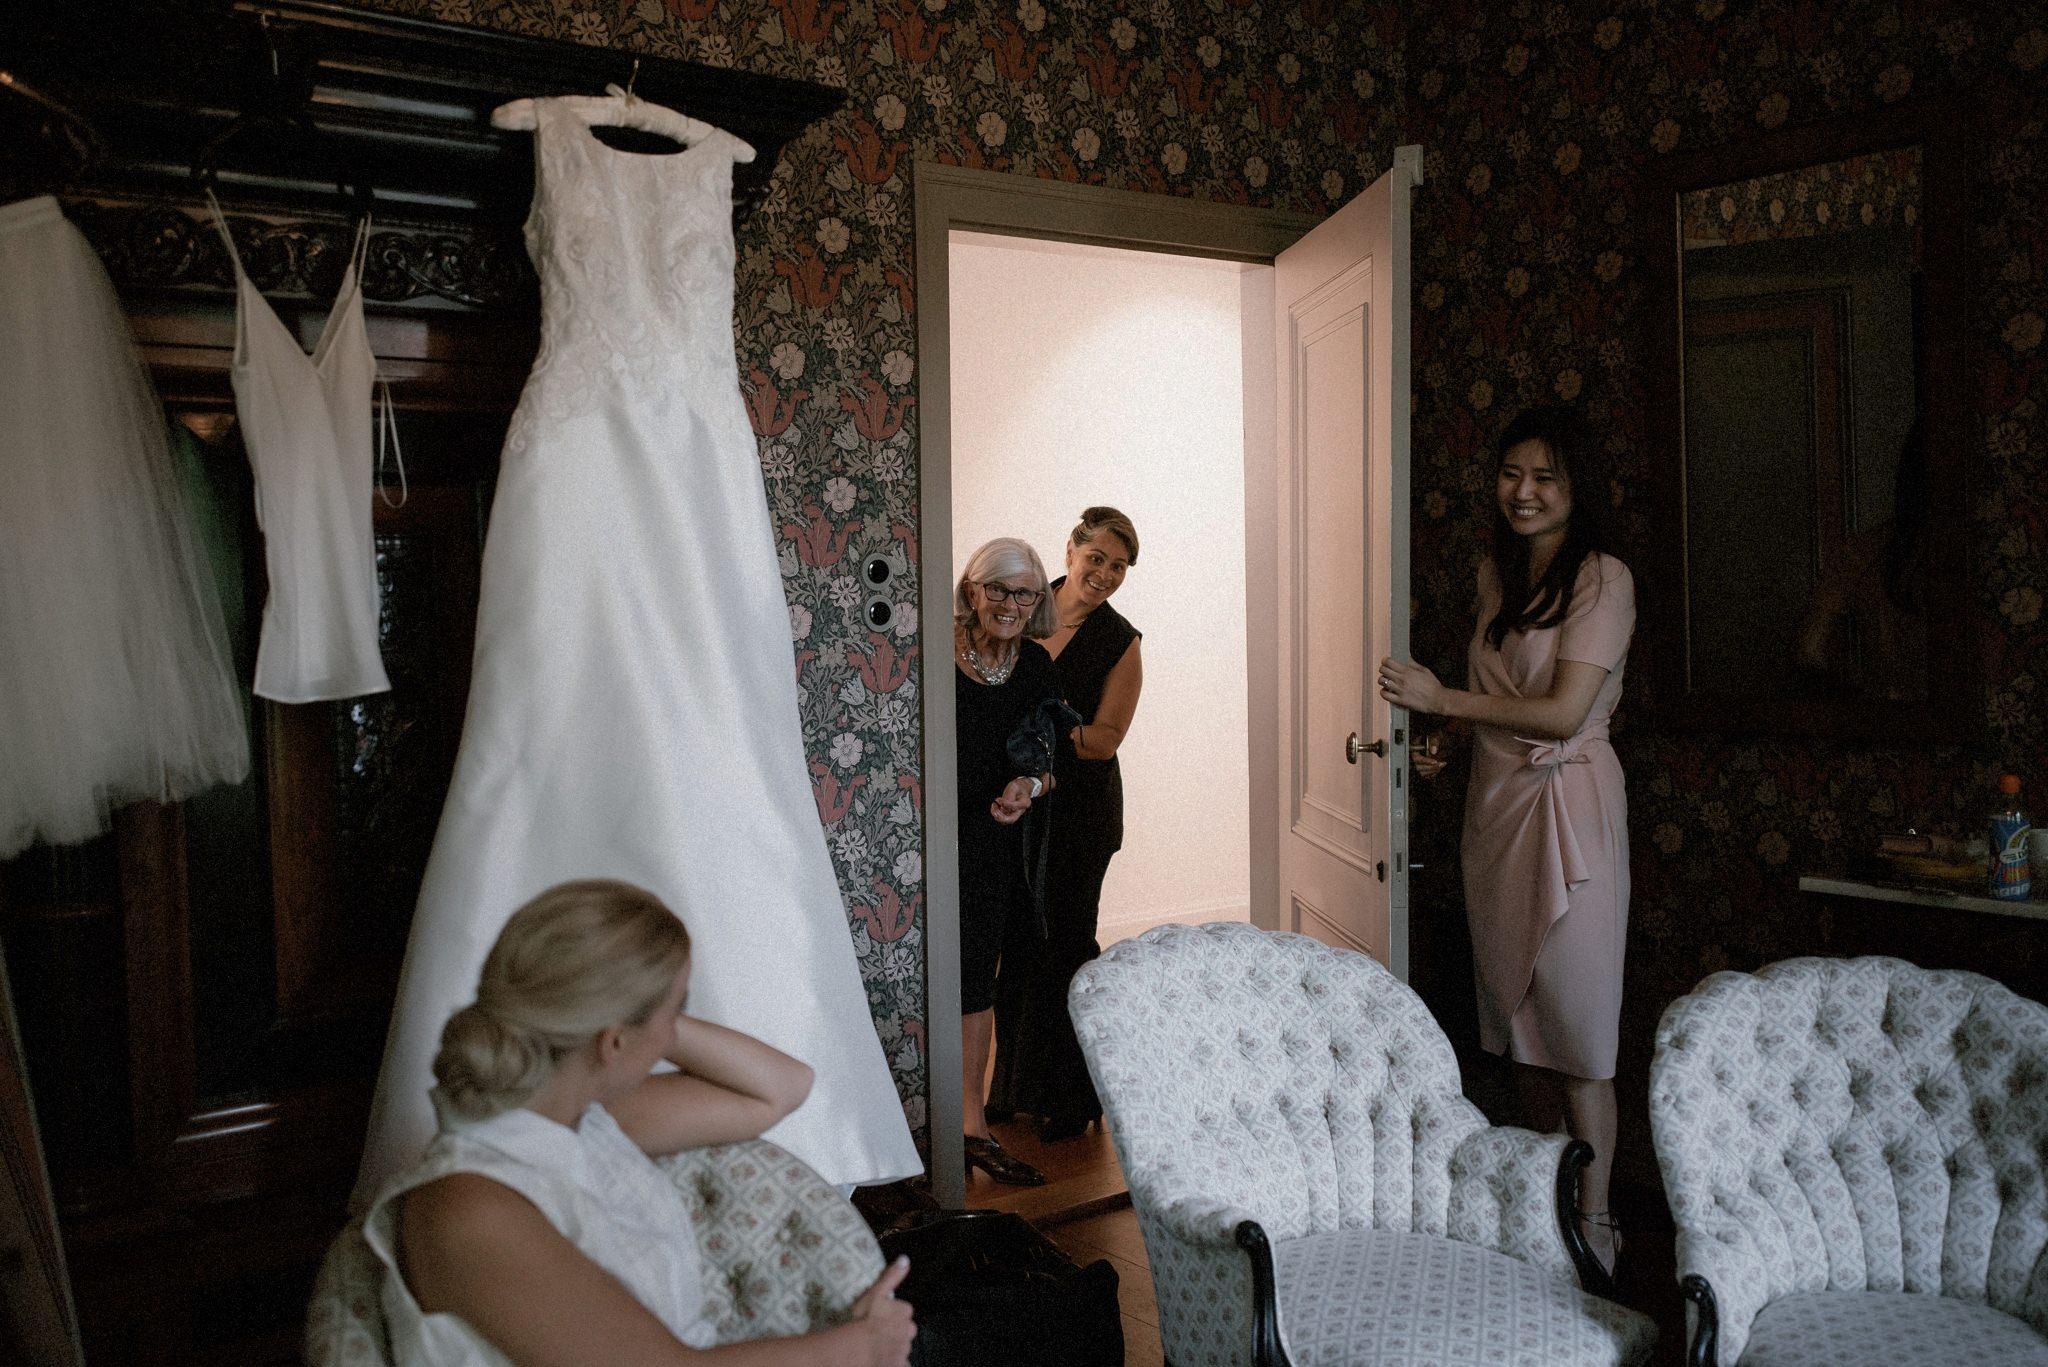 Bruidsfotografie Buitenplaats Sparrendaal - Naomi van der Kraan 0012.jpg